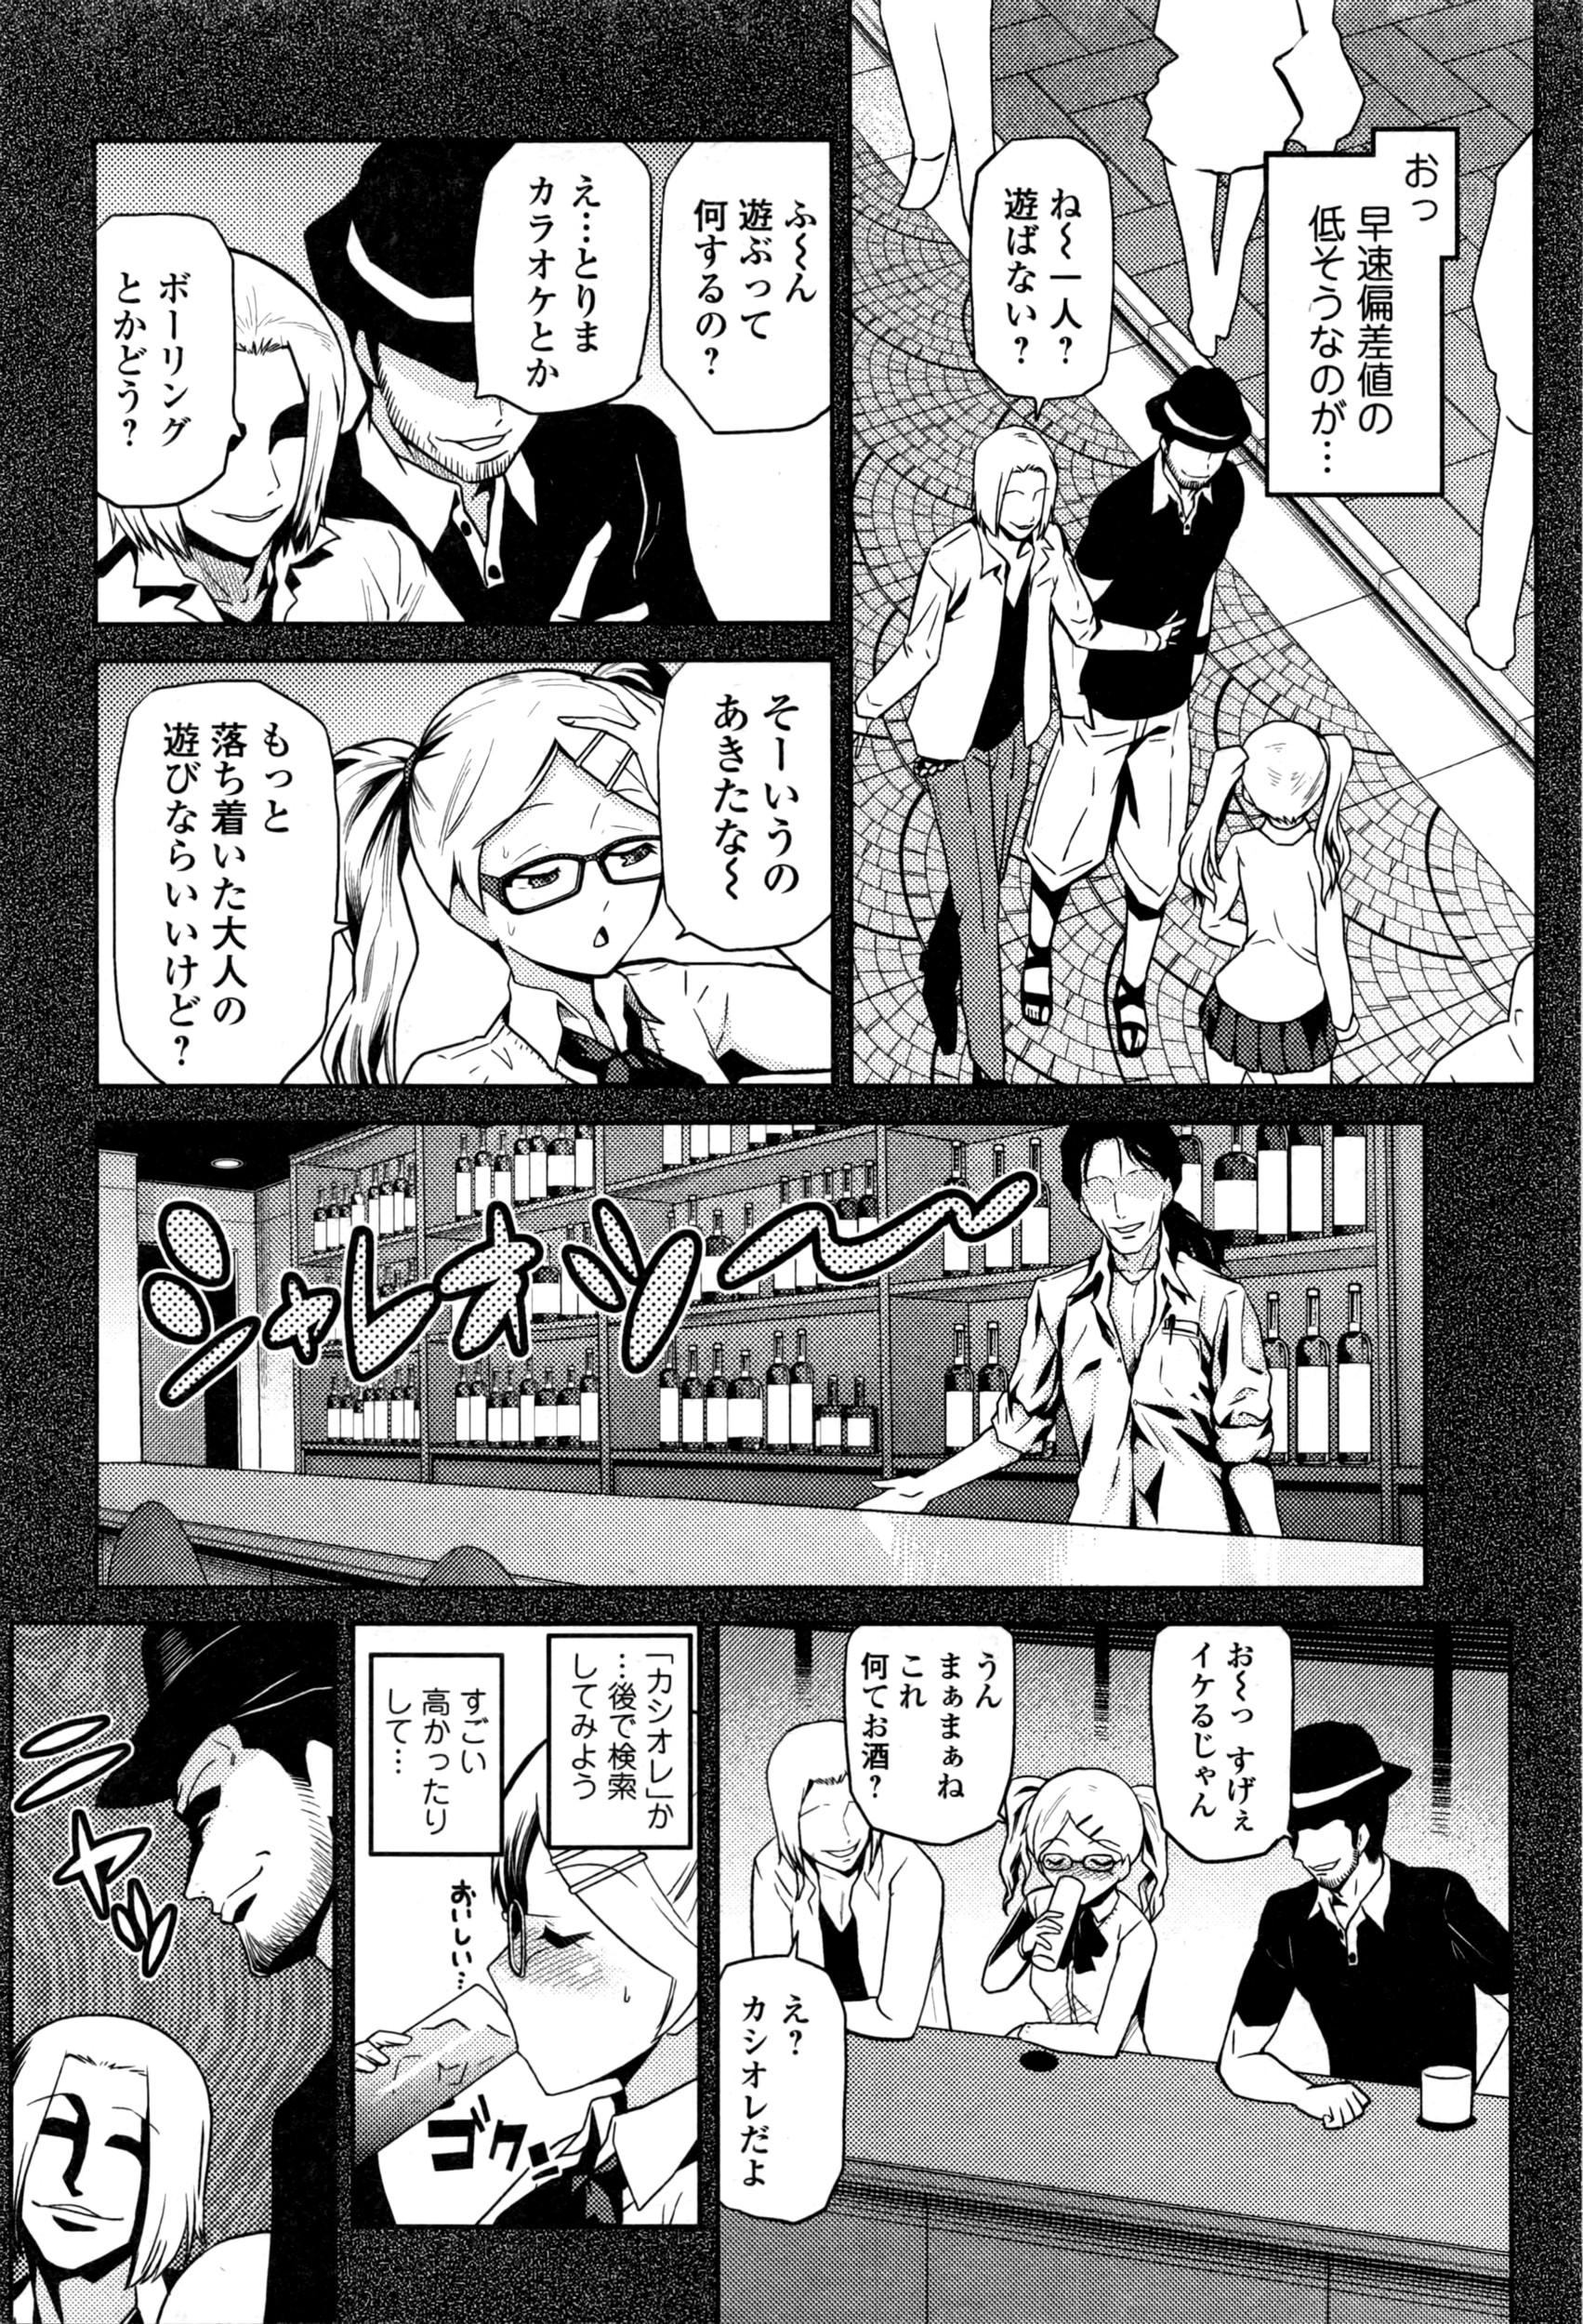 Comic JSCK Vol.3 2016-03 142